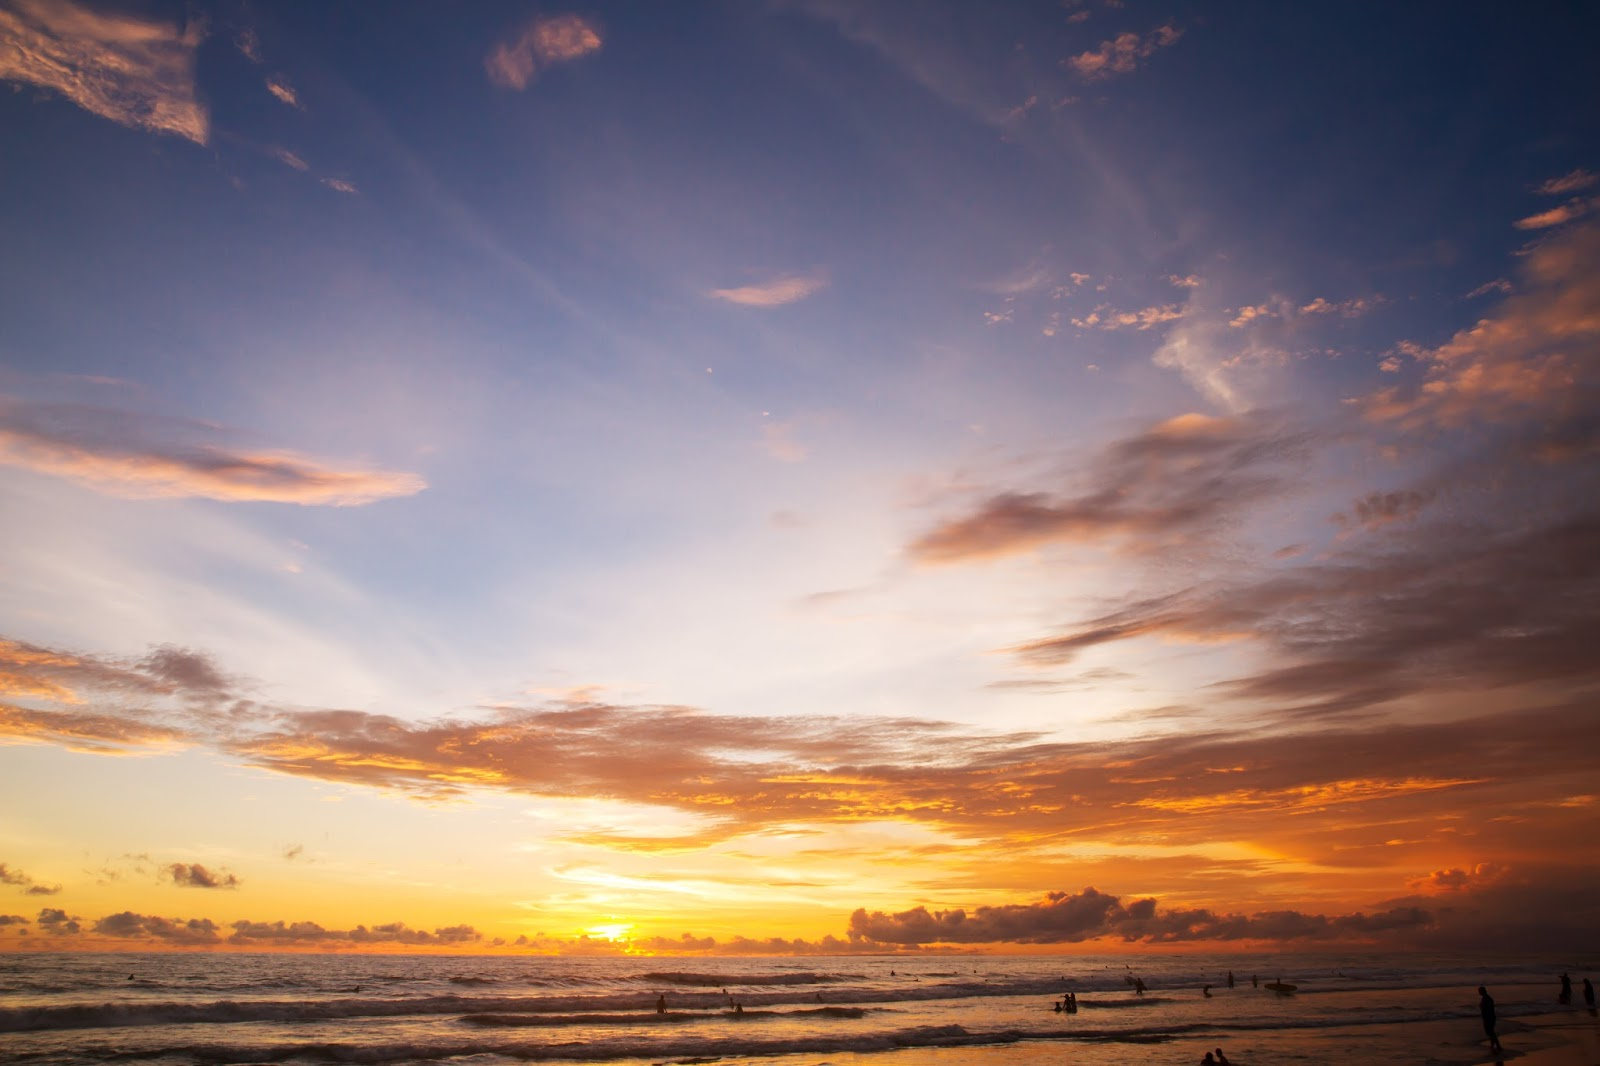 travel blogger, Alison Hutchinson, catching the sunset at Berawa Beach in Canggu, Bali